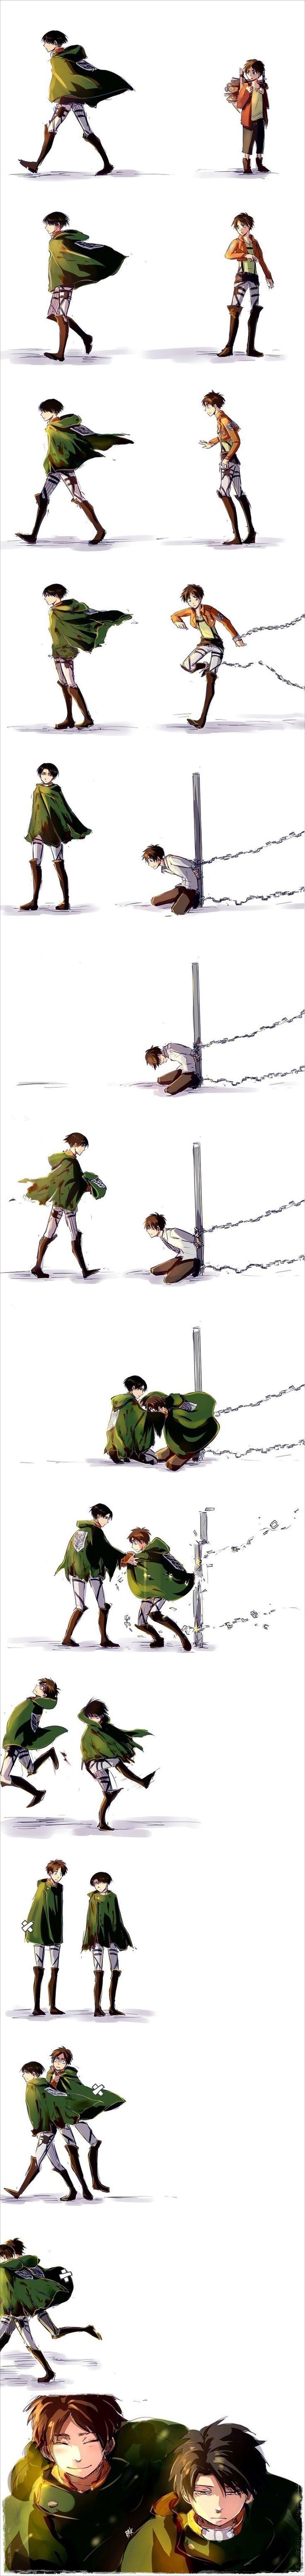 Attack on Titan (Shingeki no Kyojin) - Eren Yeager x Levi Ackerman - Ereri